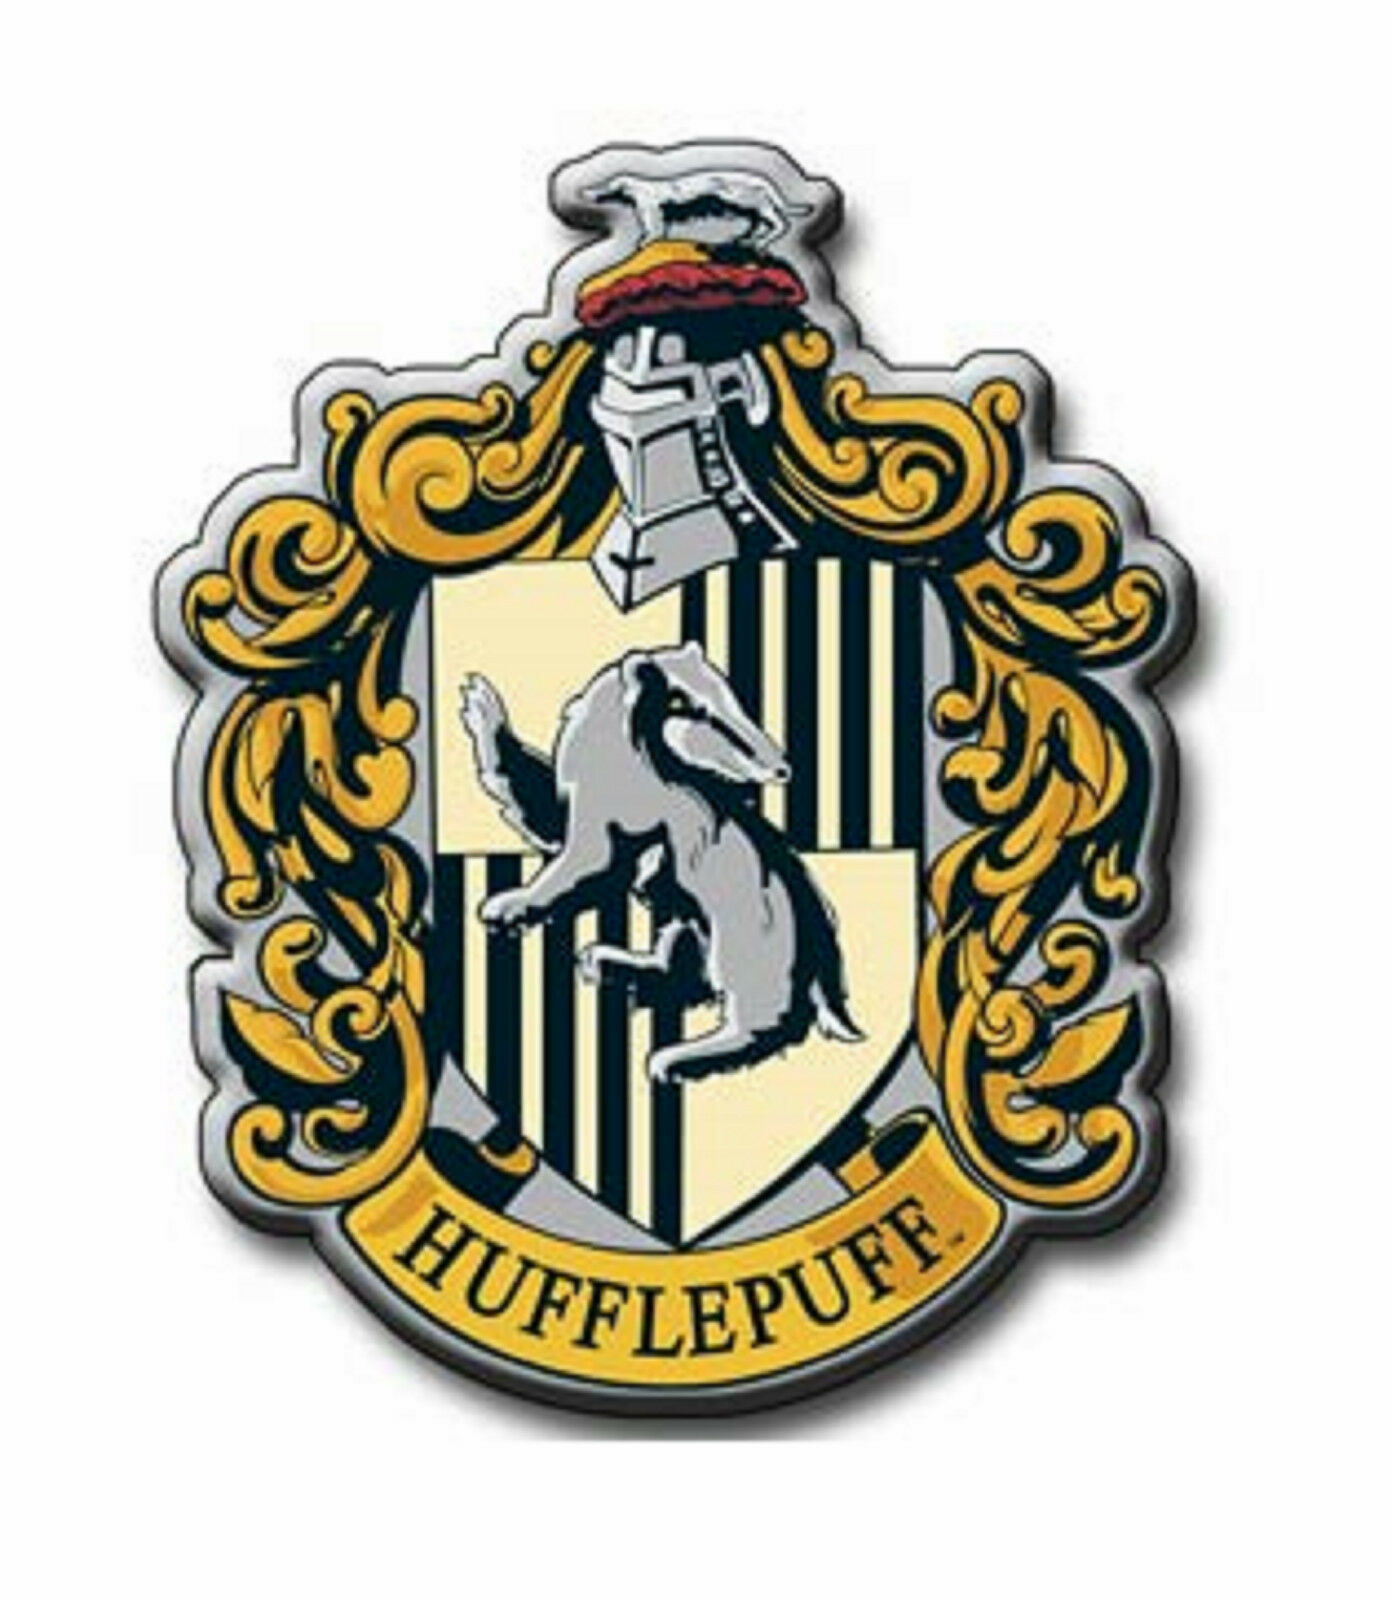 Official Harry Potter Hufflepuff Metal Magnet TV Film Gift Magic Wizard Hogwarts - $10.98